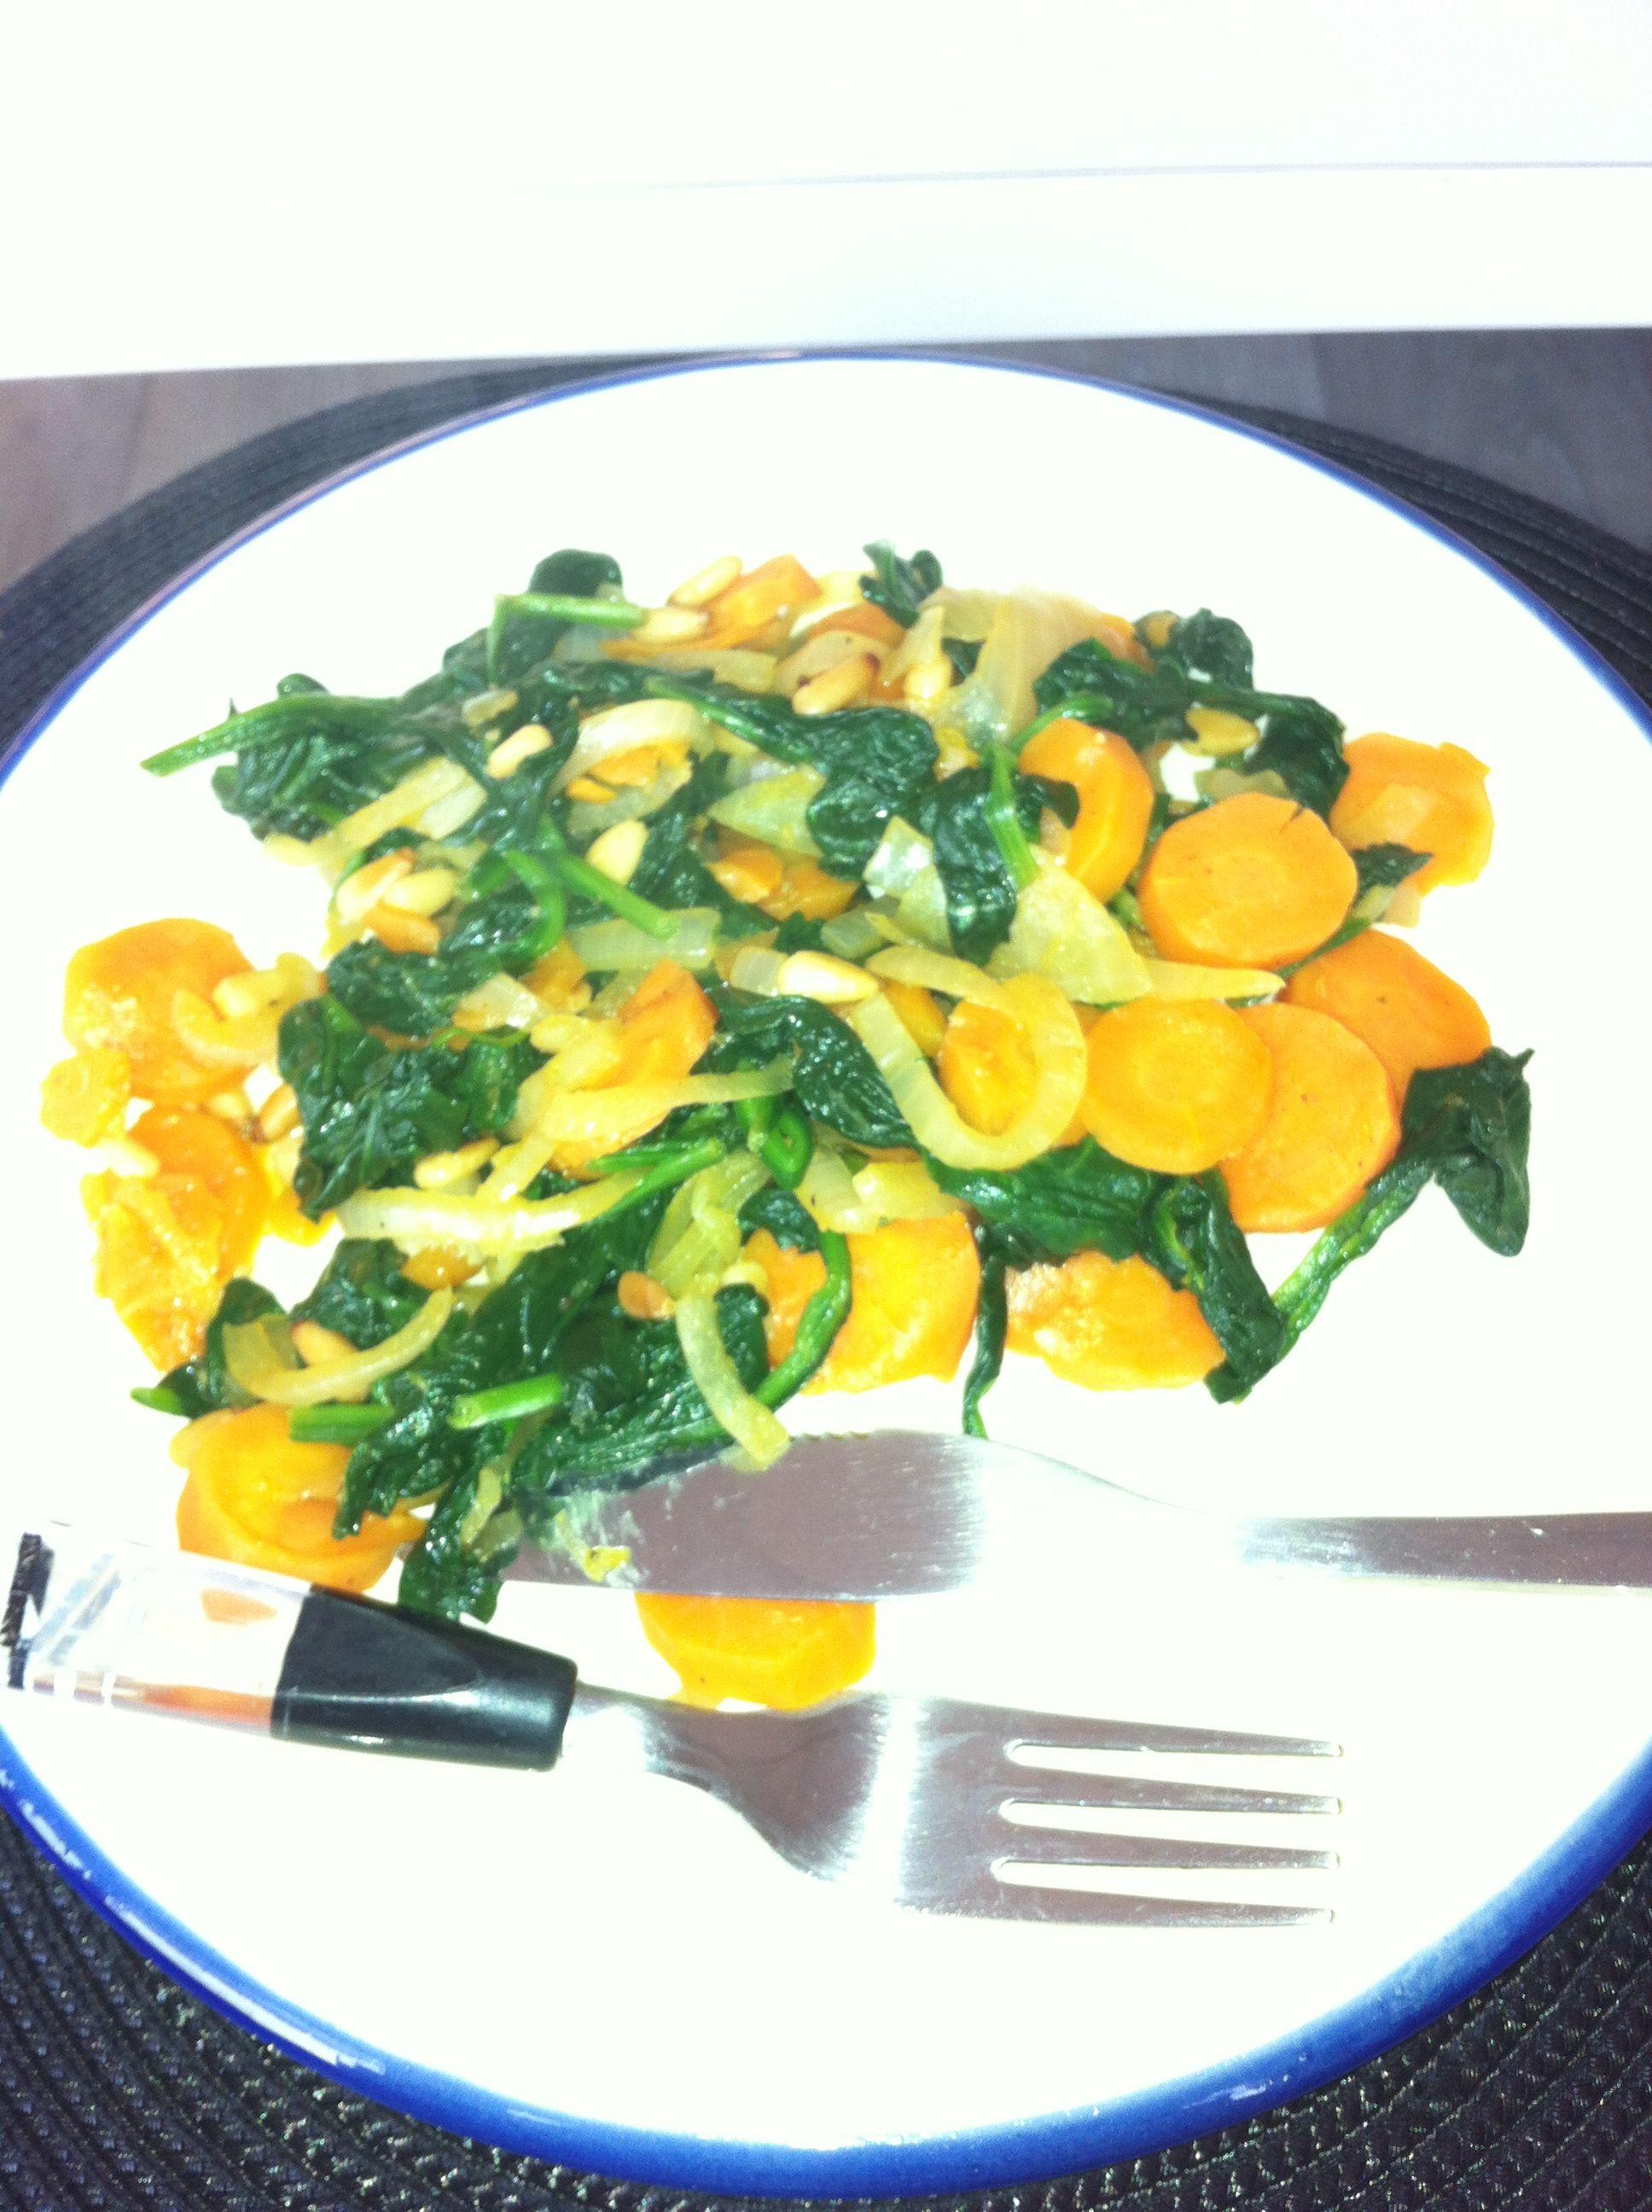 Spinazie, wortel, ui, pikante paprika poeder en gegrilde pijnboompitjes